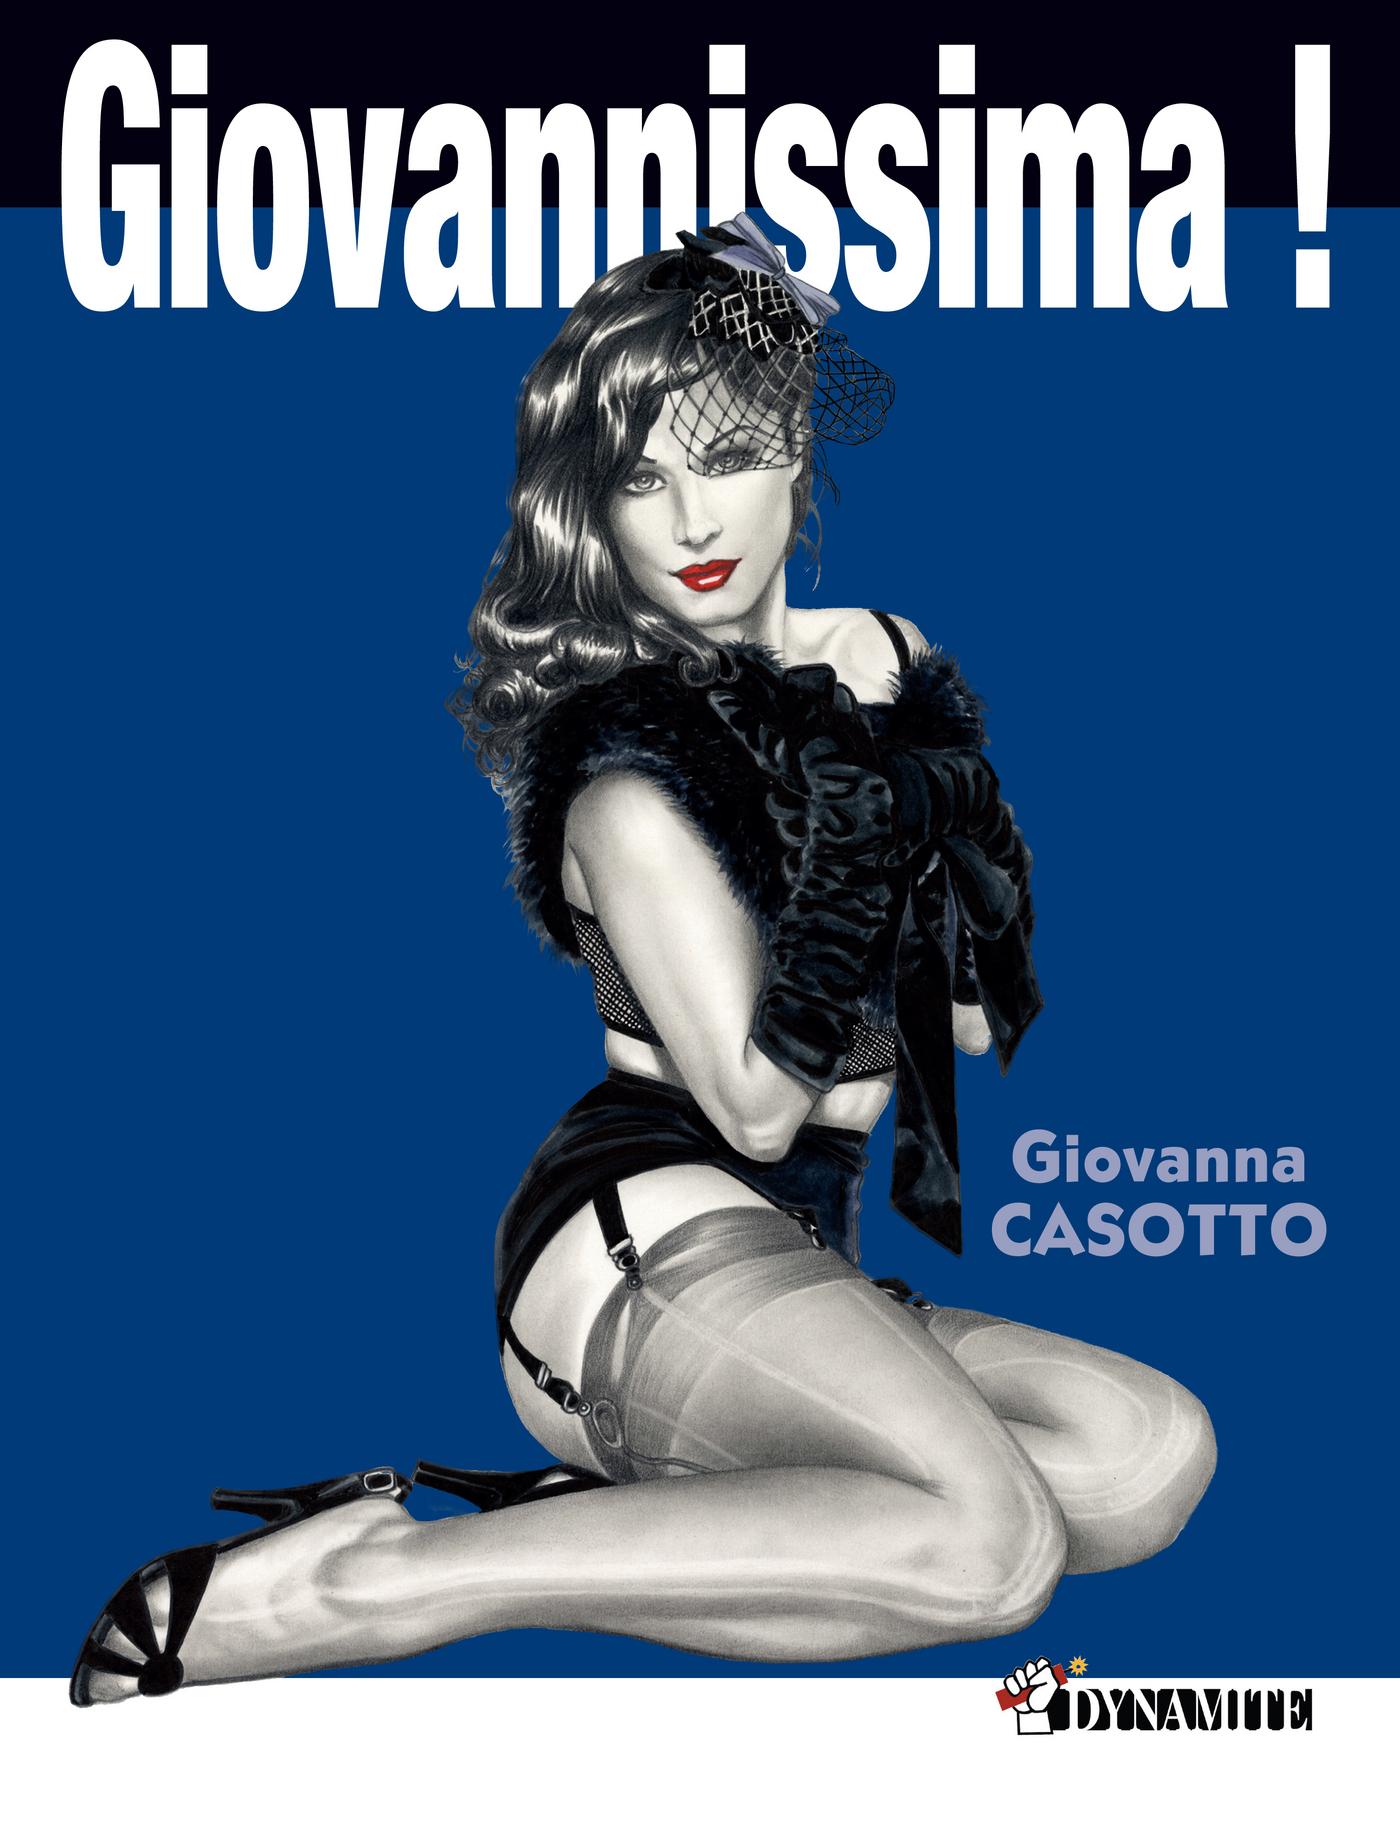 Giovannissima !